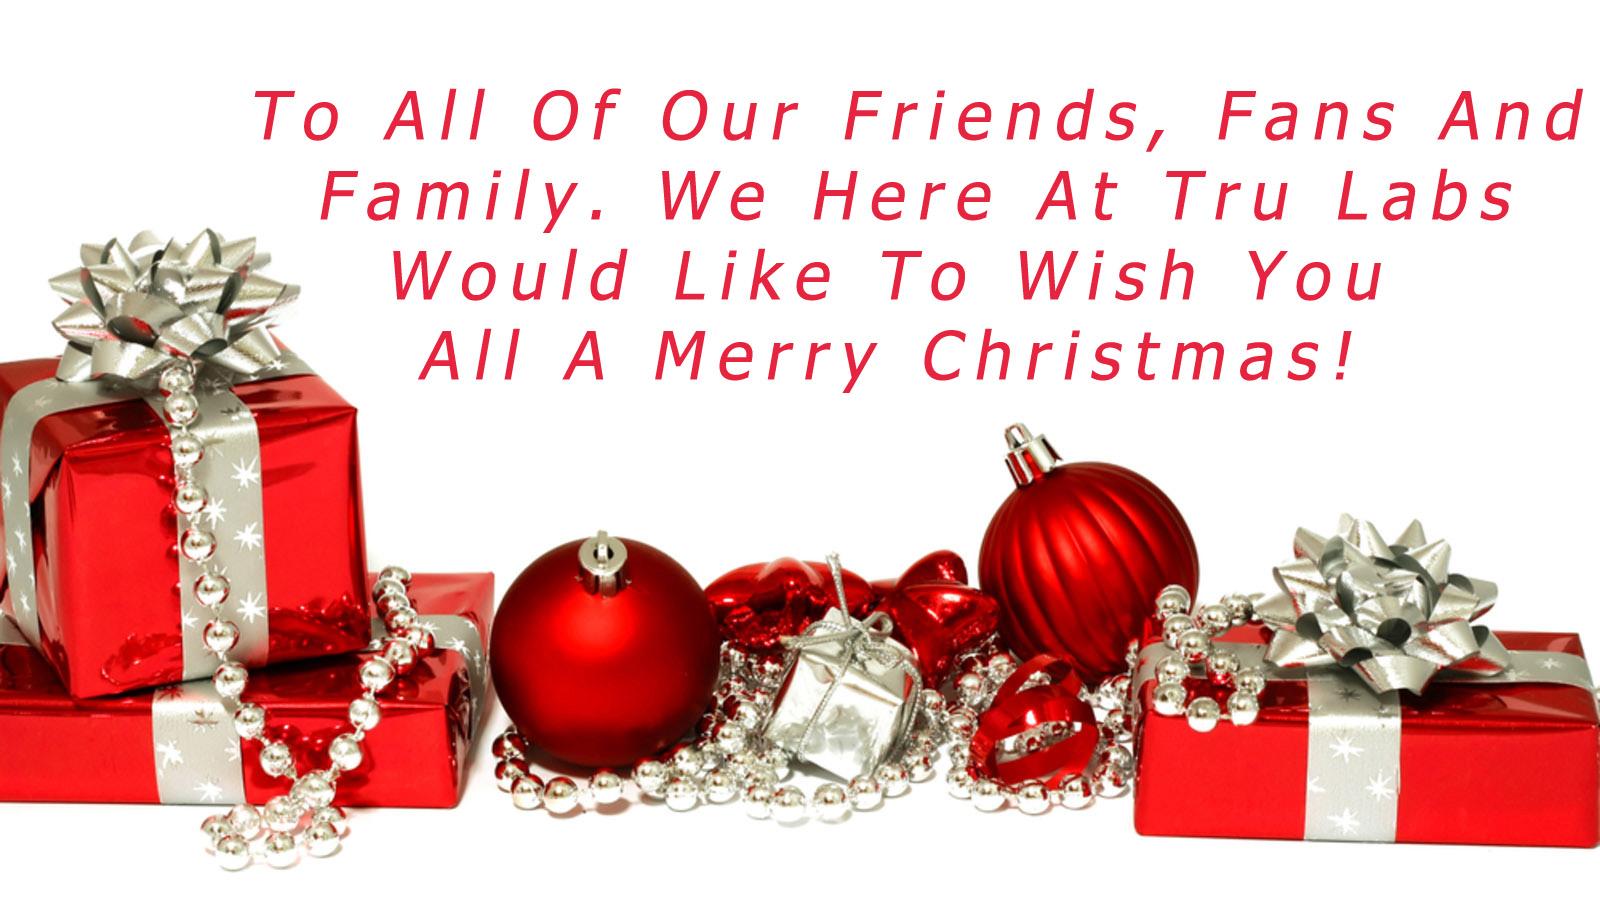 merry-christmas-card-xmas-2014.jpg